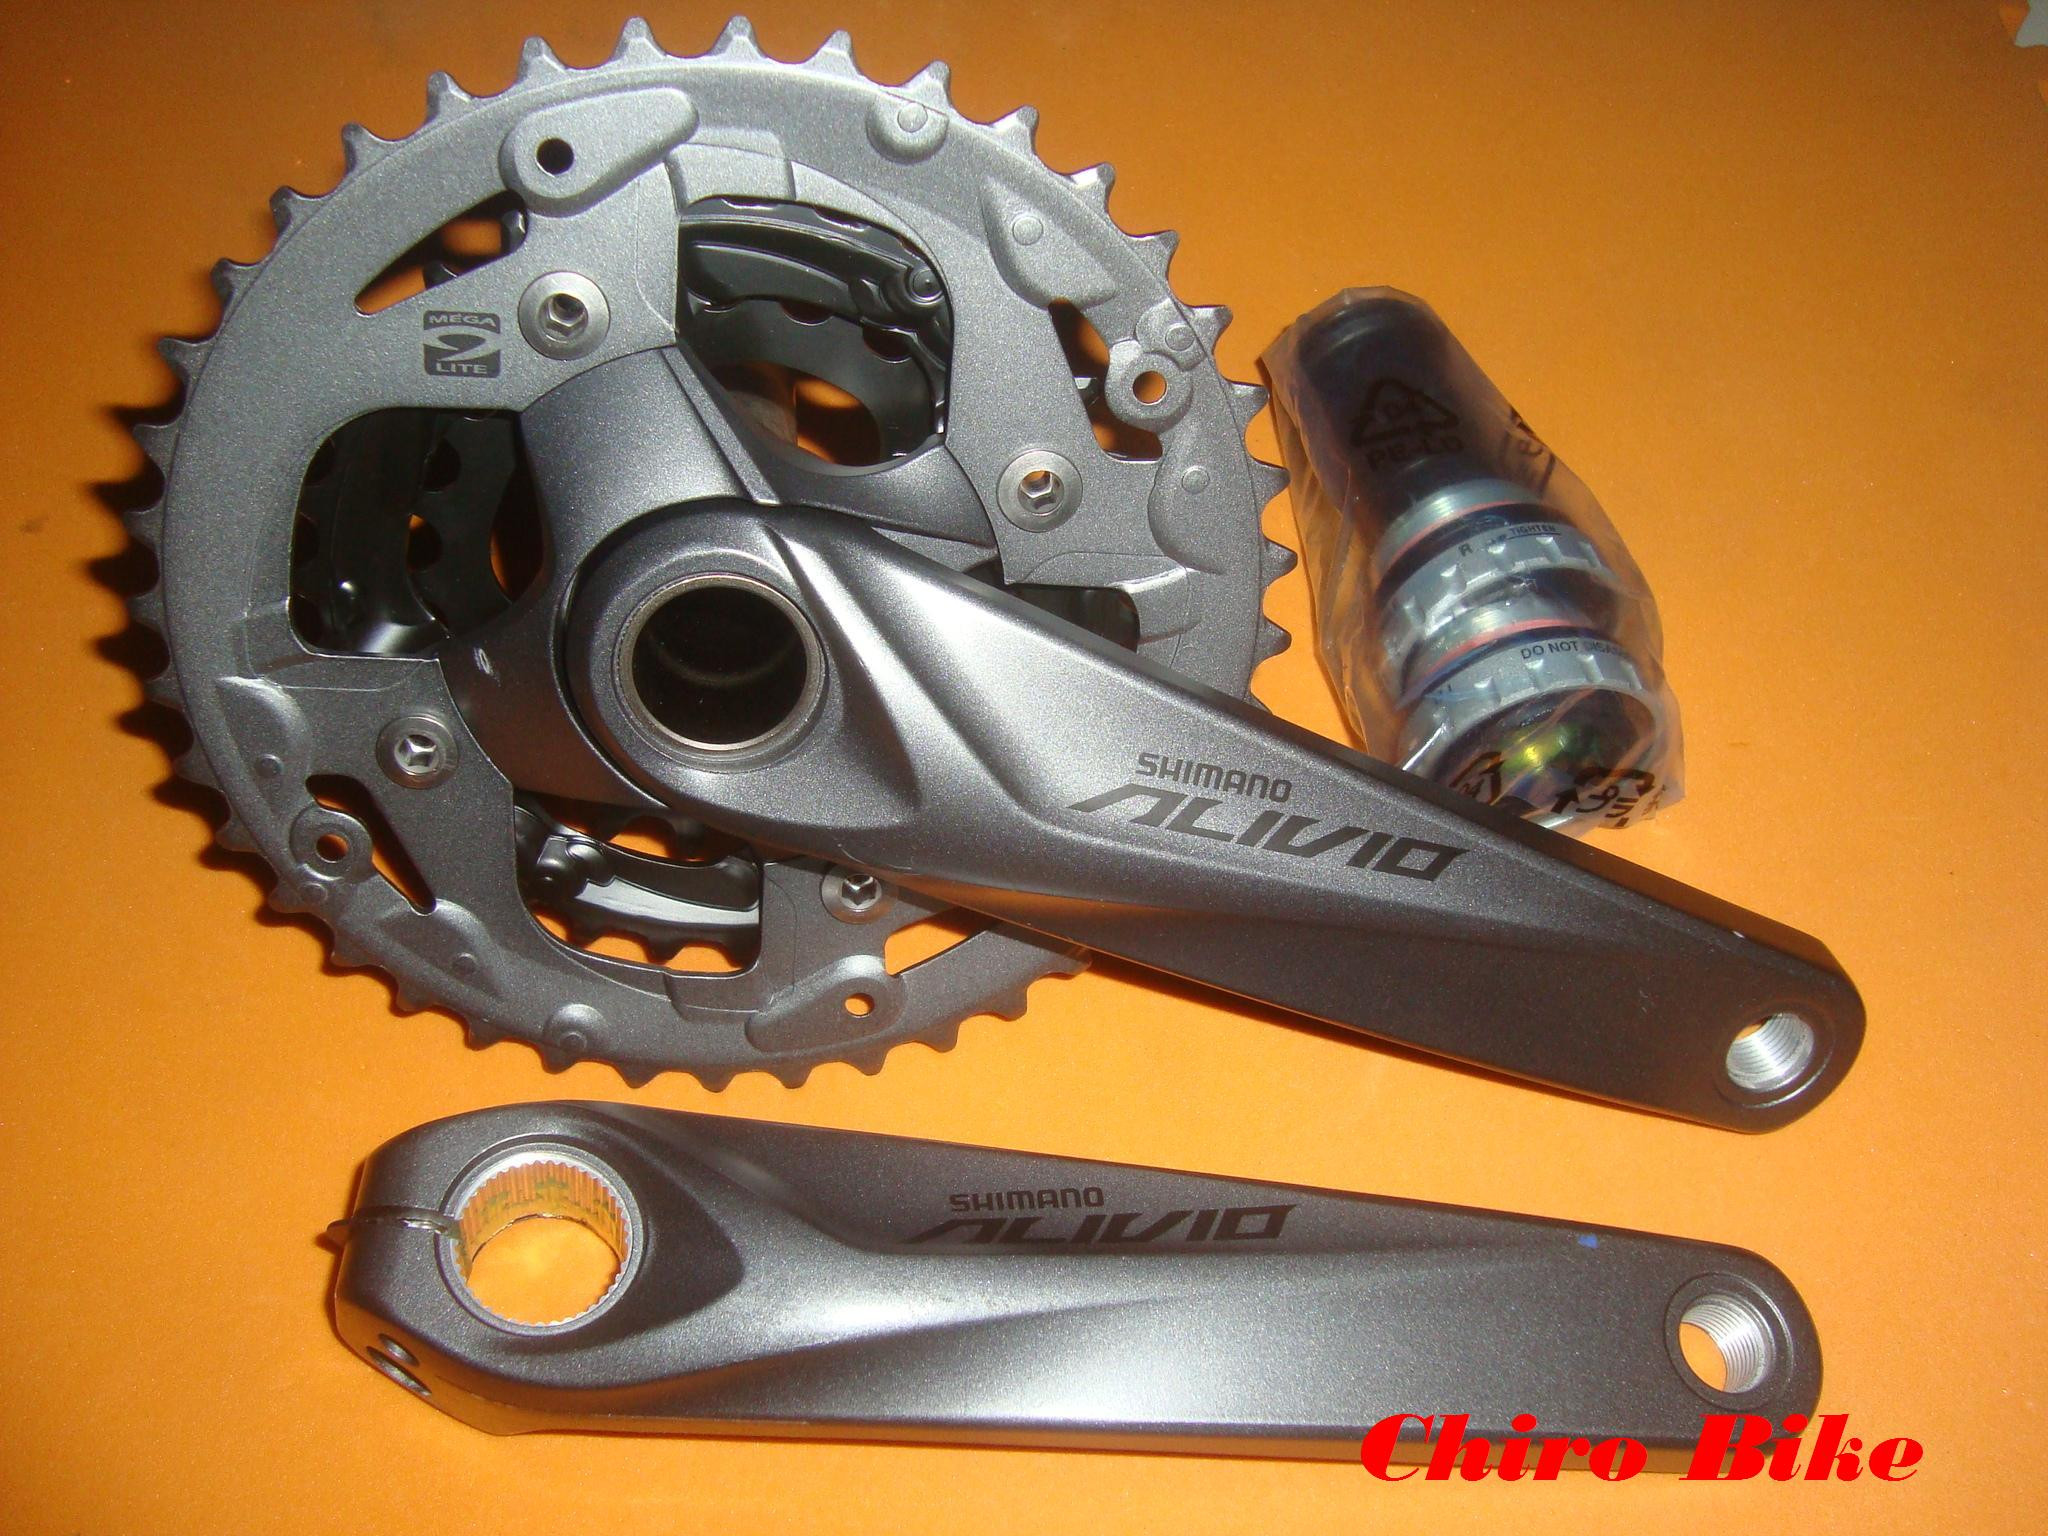 Jual Crank Alivio M4050 Bb Ht2 Chiro Bike Tokopedia Crankset 40t